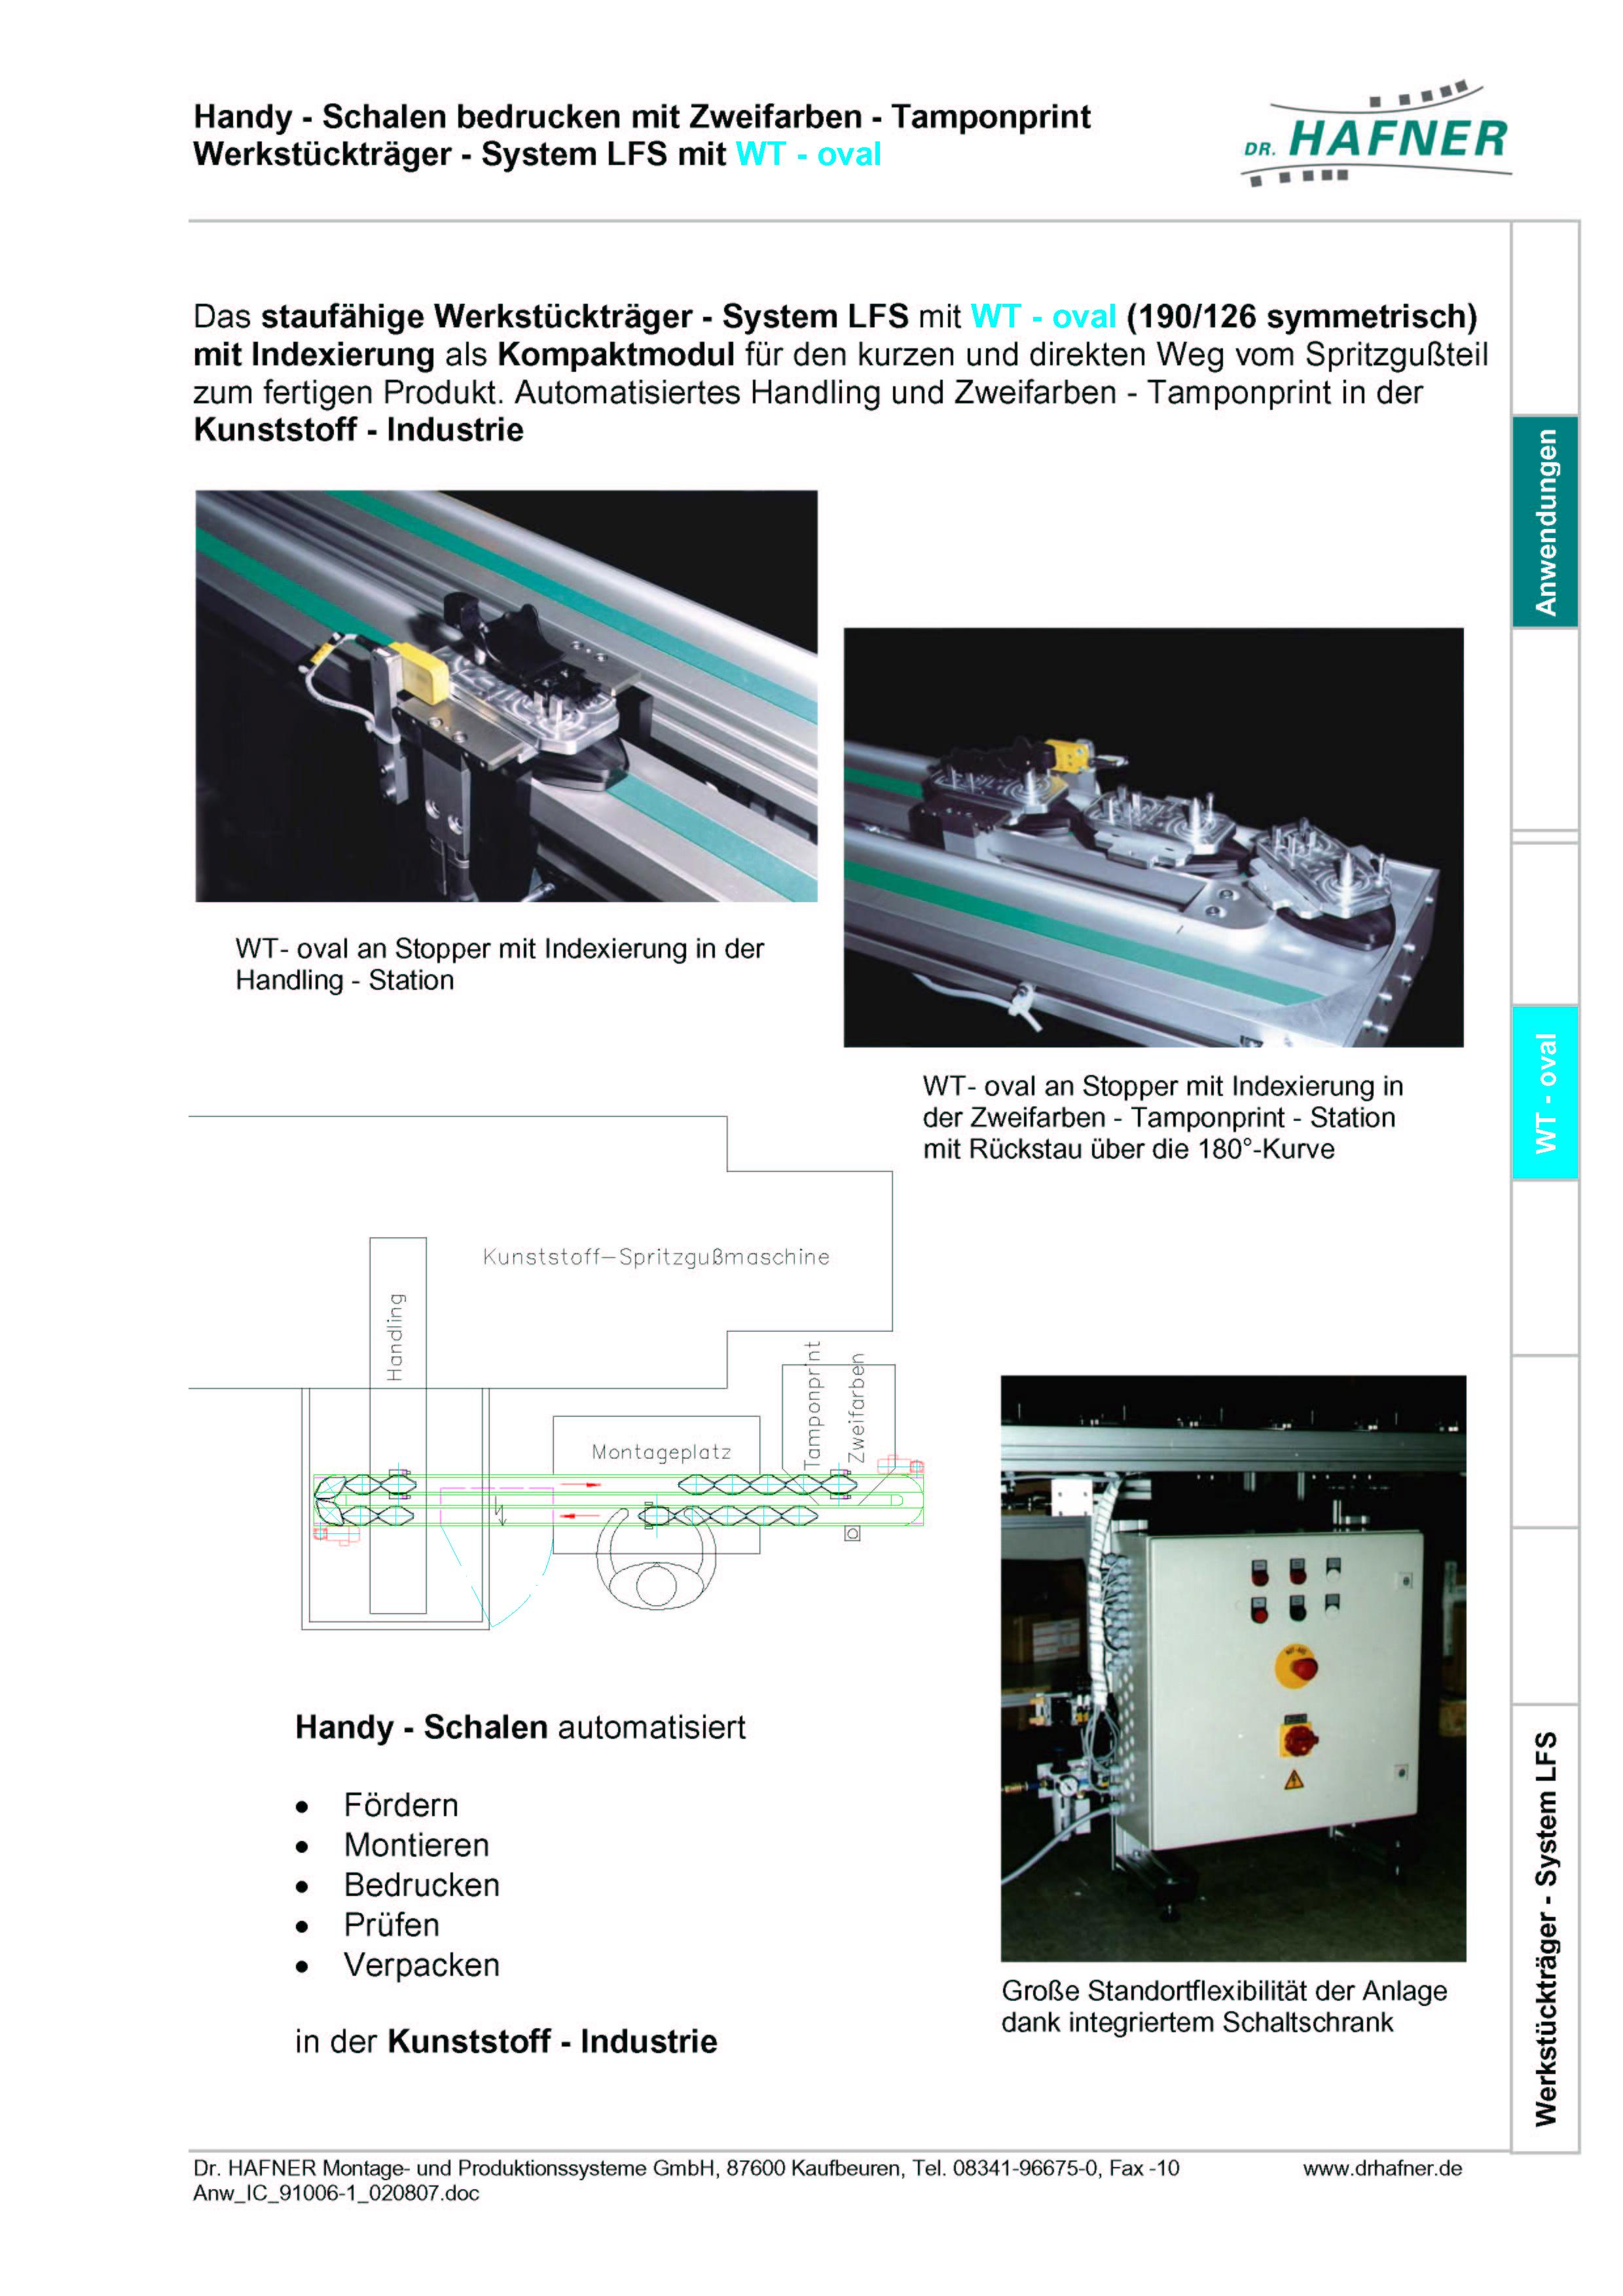 Dr. HAFNER_PKWP_25 Handy Schalen bedrucken Werkstückträger